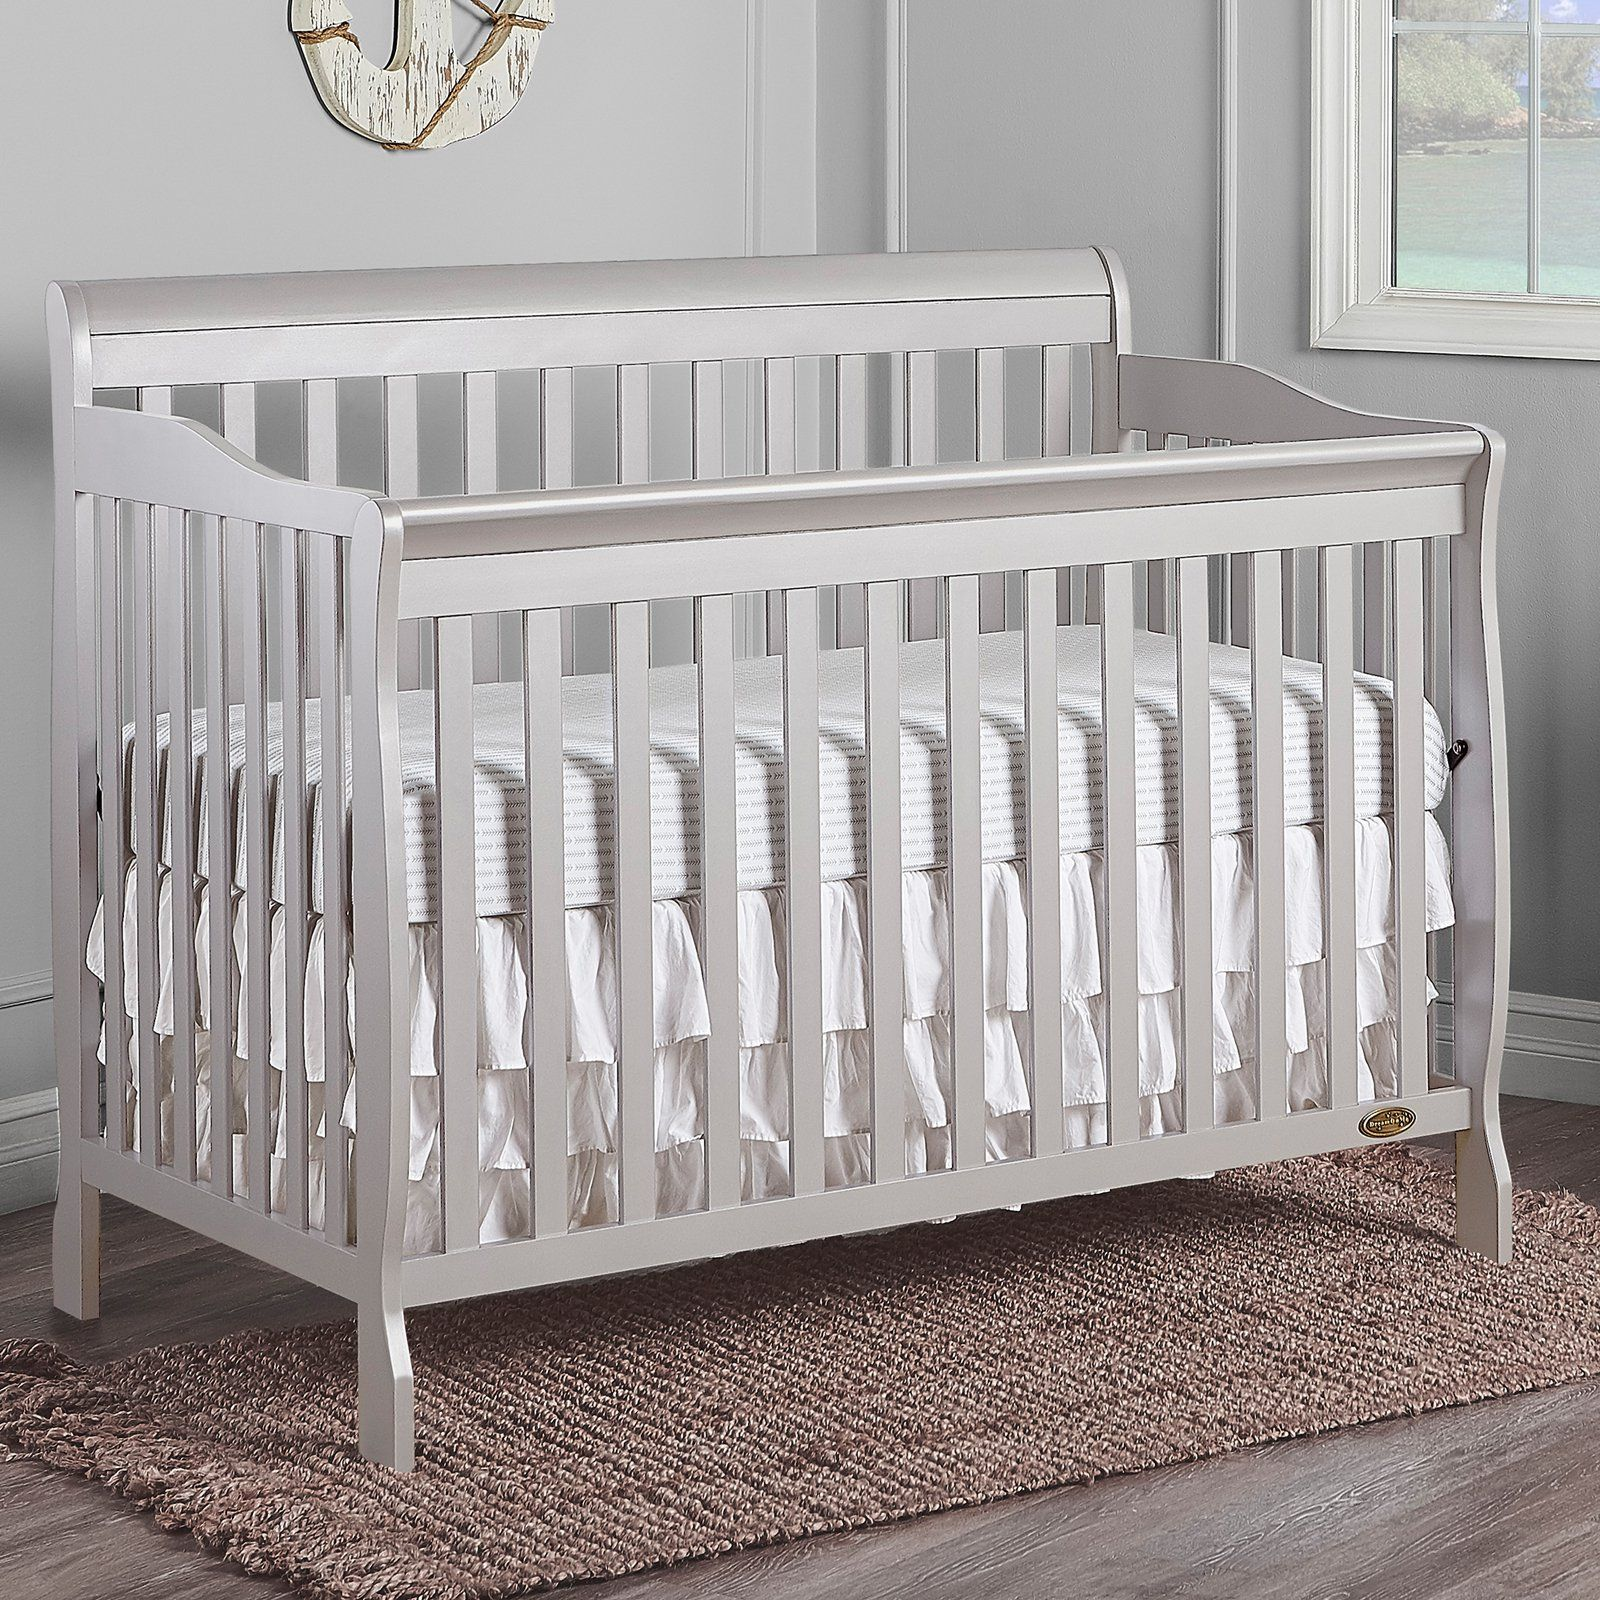 Dream On Me Ashton 5 In 1 Convertible Crib Cribs White Nursery Furniture Convertible Crib